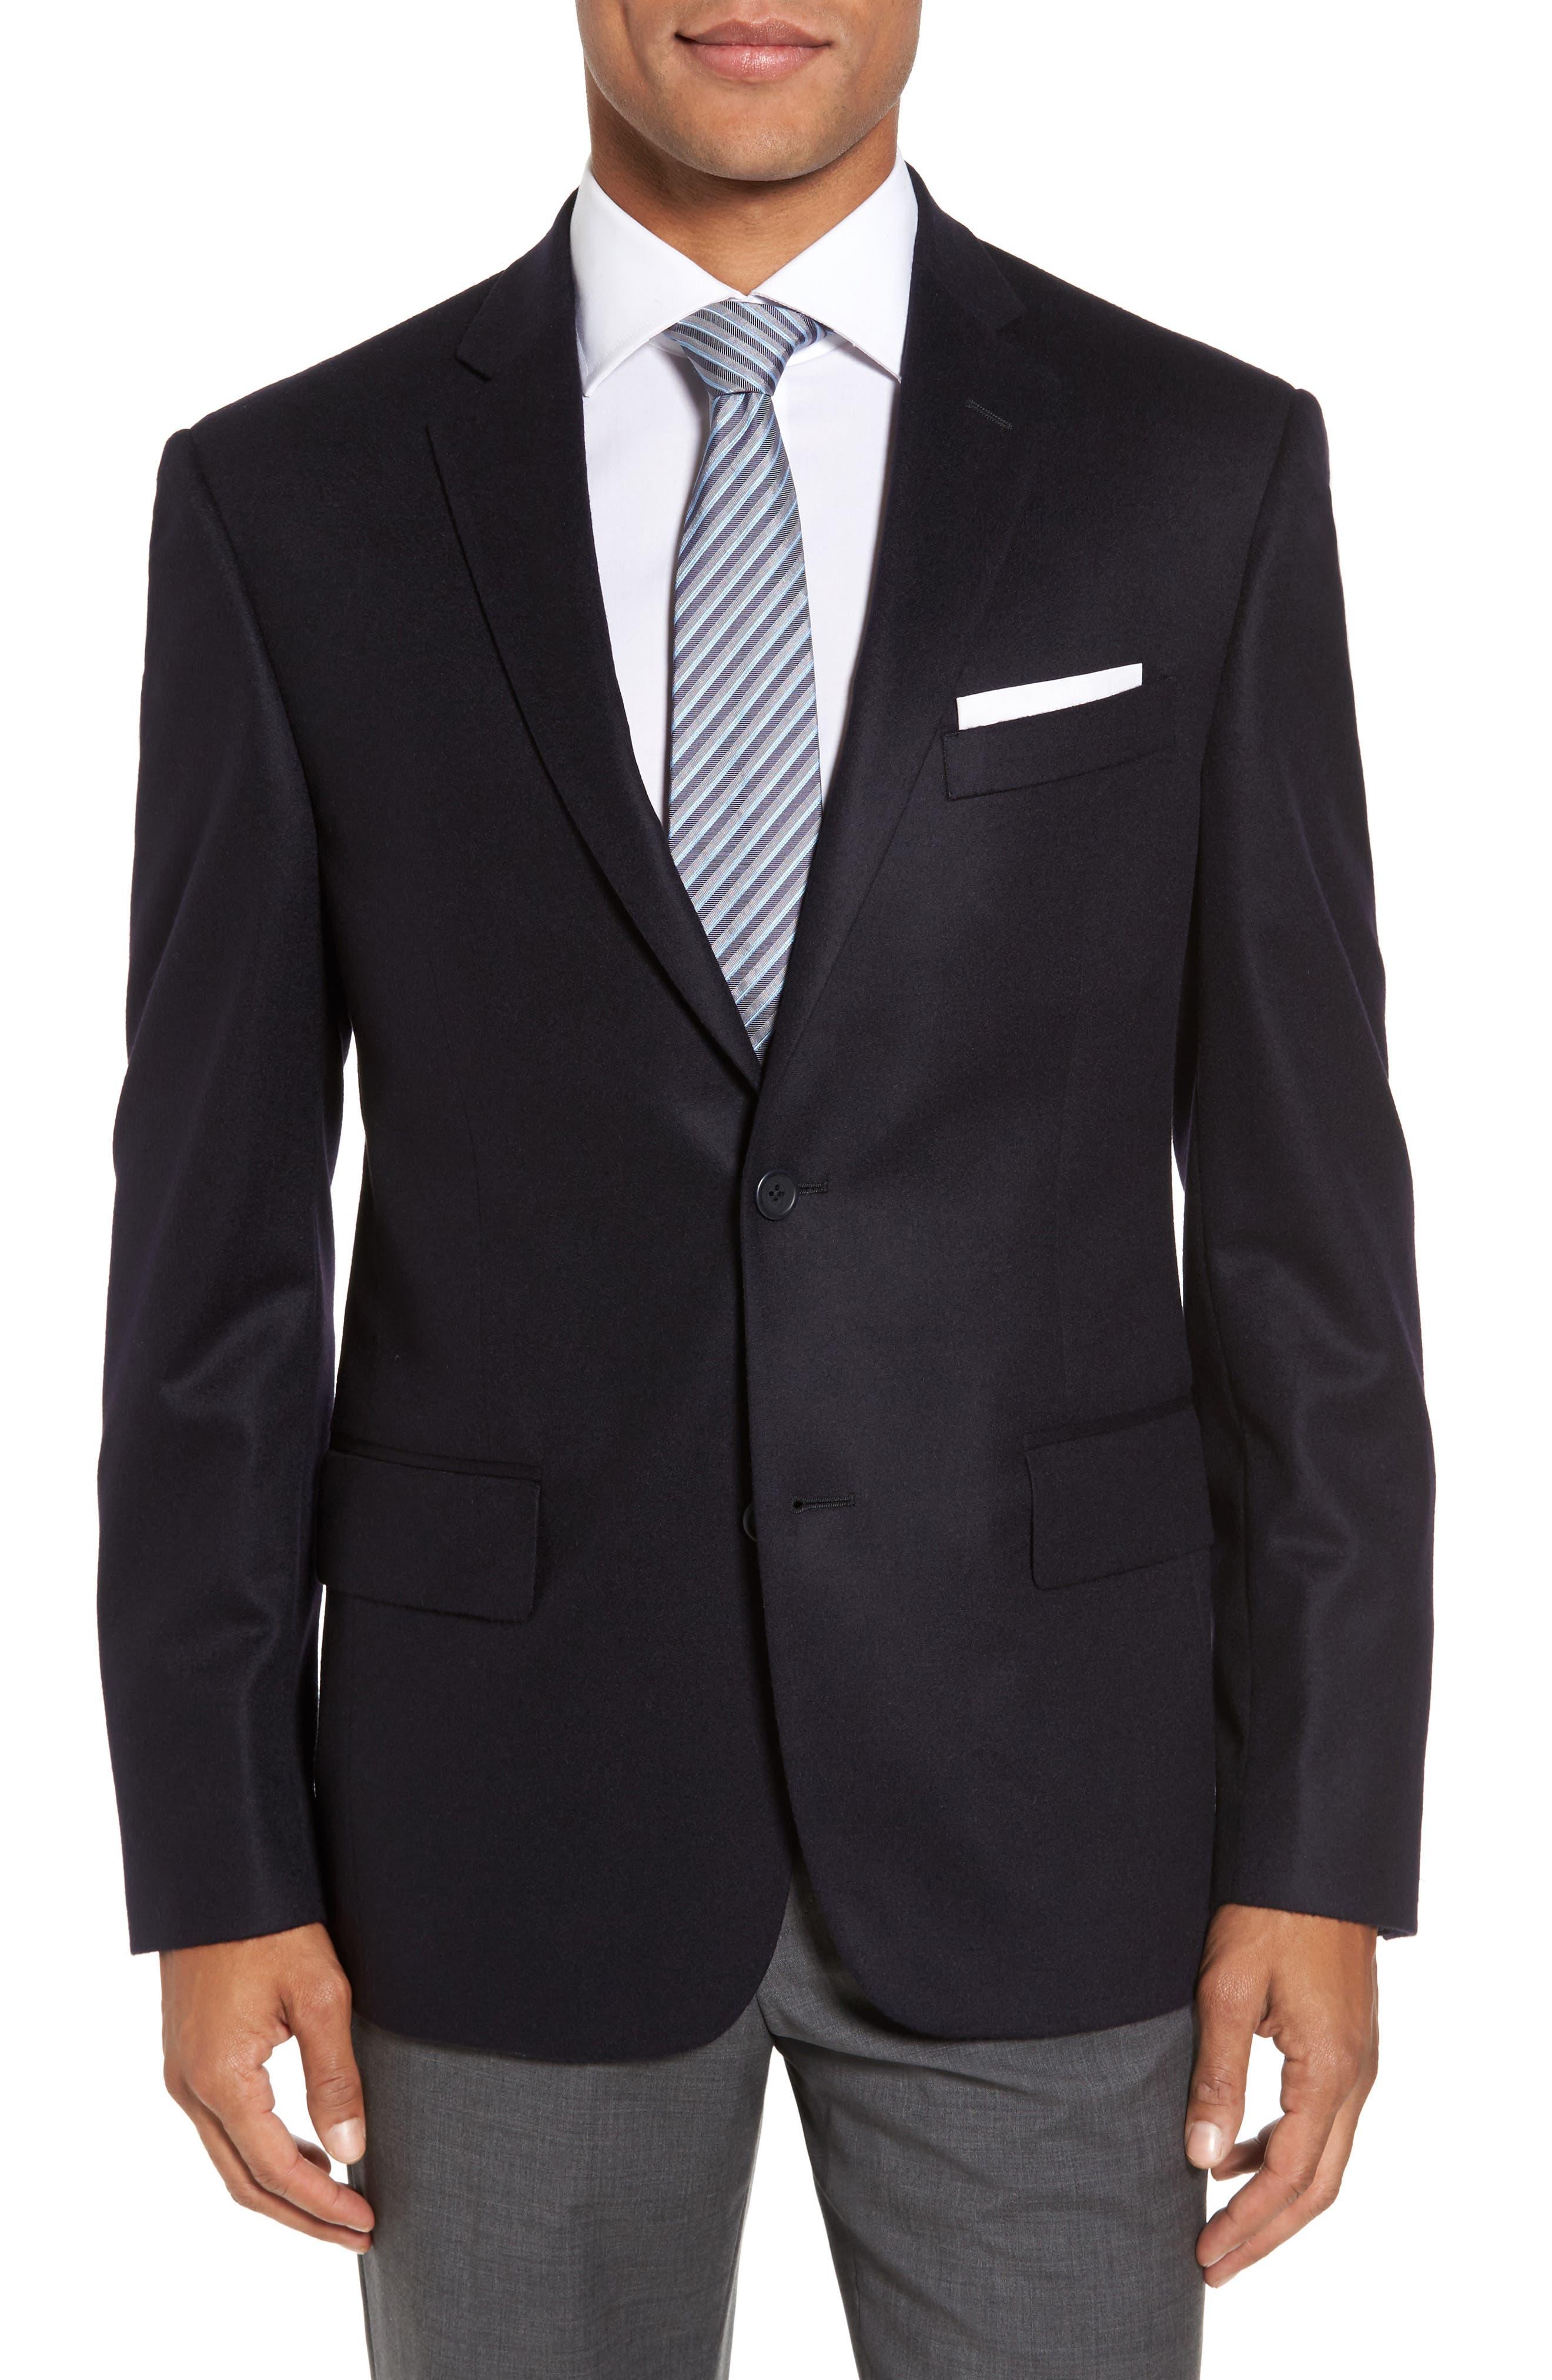 Alternate Image 1 Selected - Nordstrom Men's Shop Classic Fit Cashmere Blazer